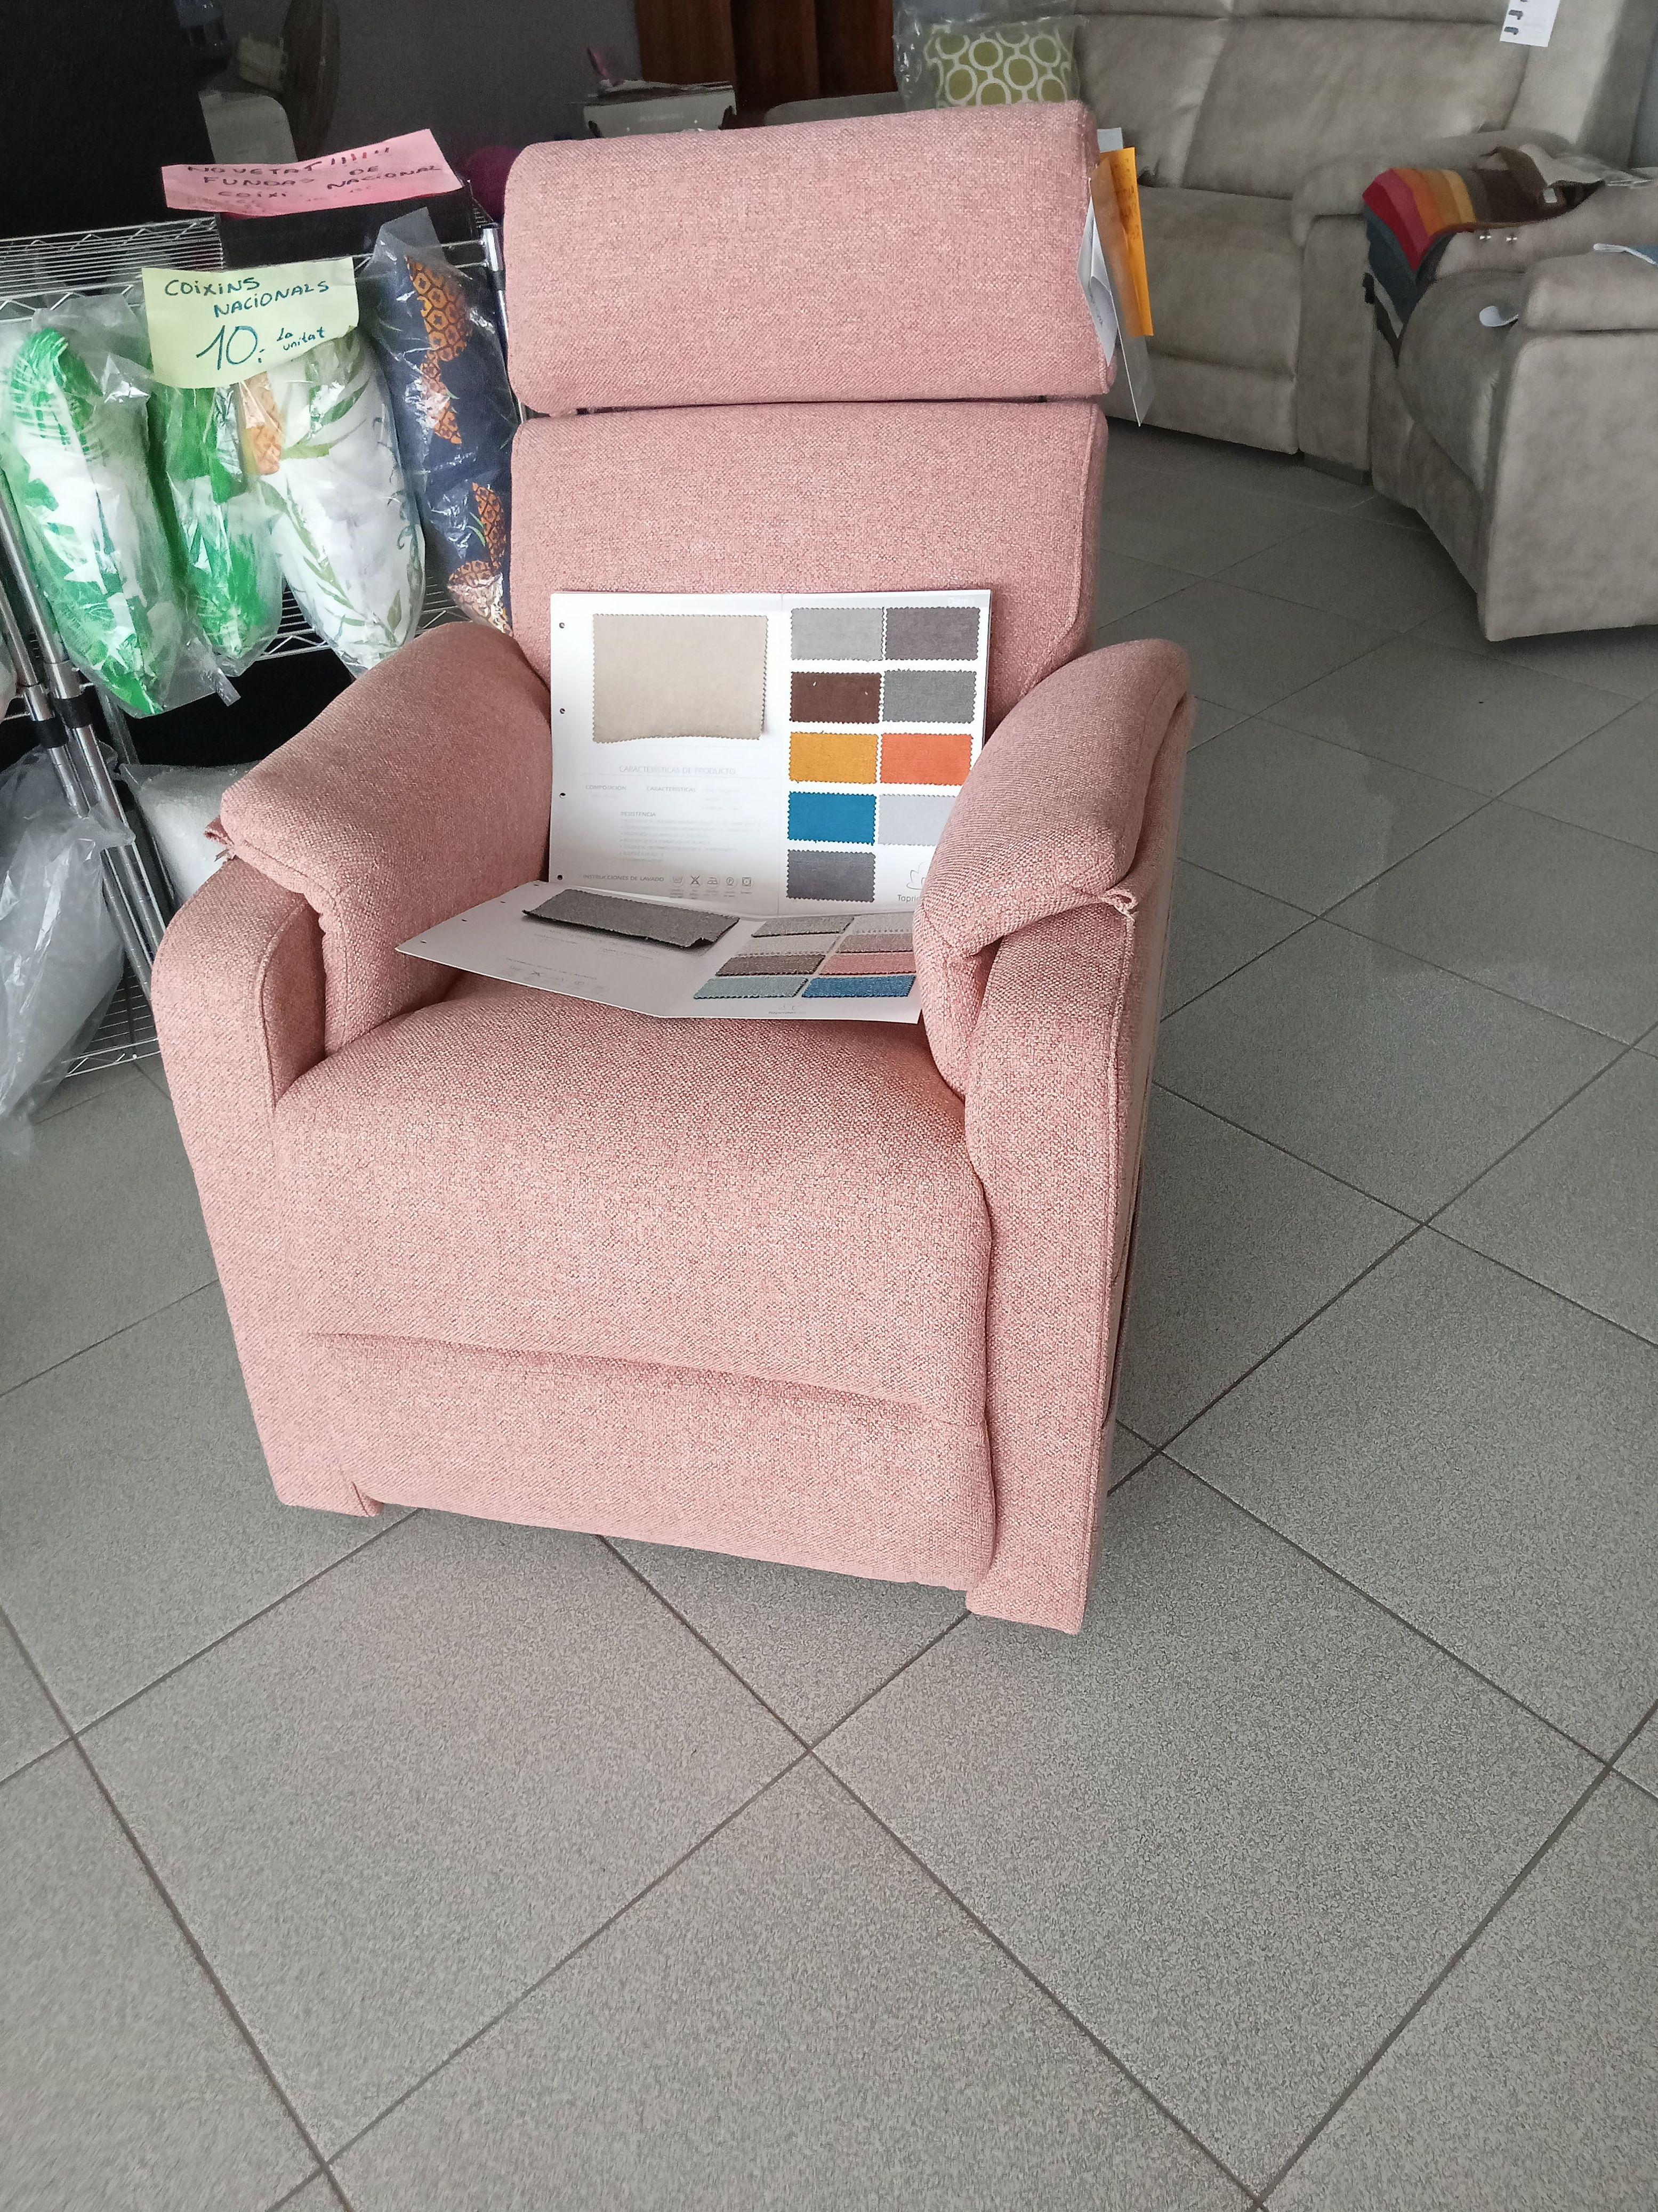 Foto 7 de Colchones, sofás y canapés en  | PS Sofás